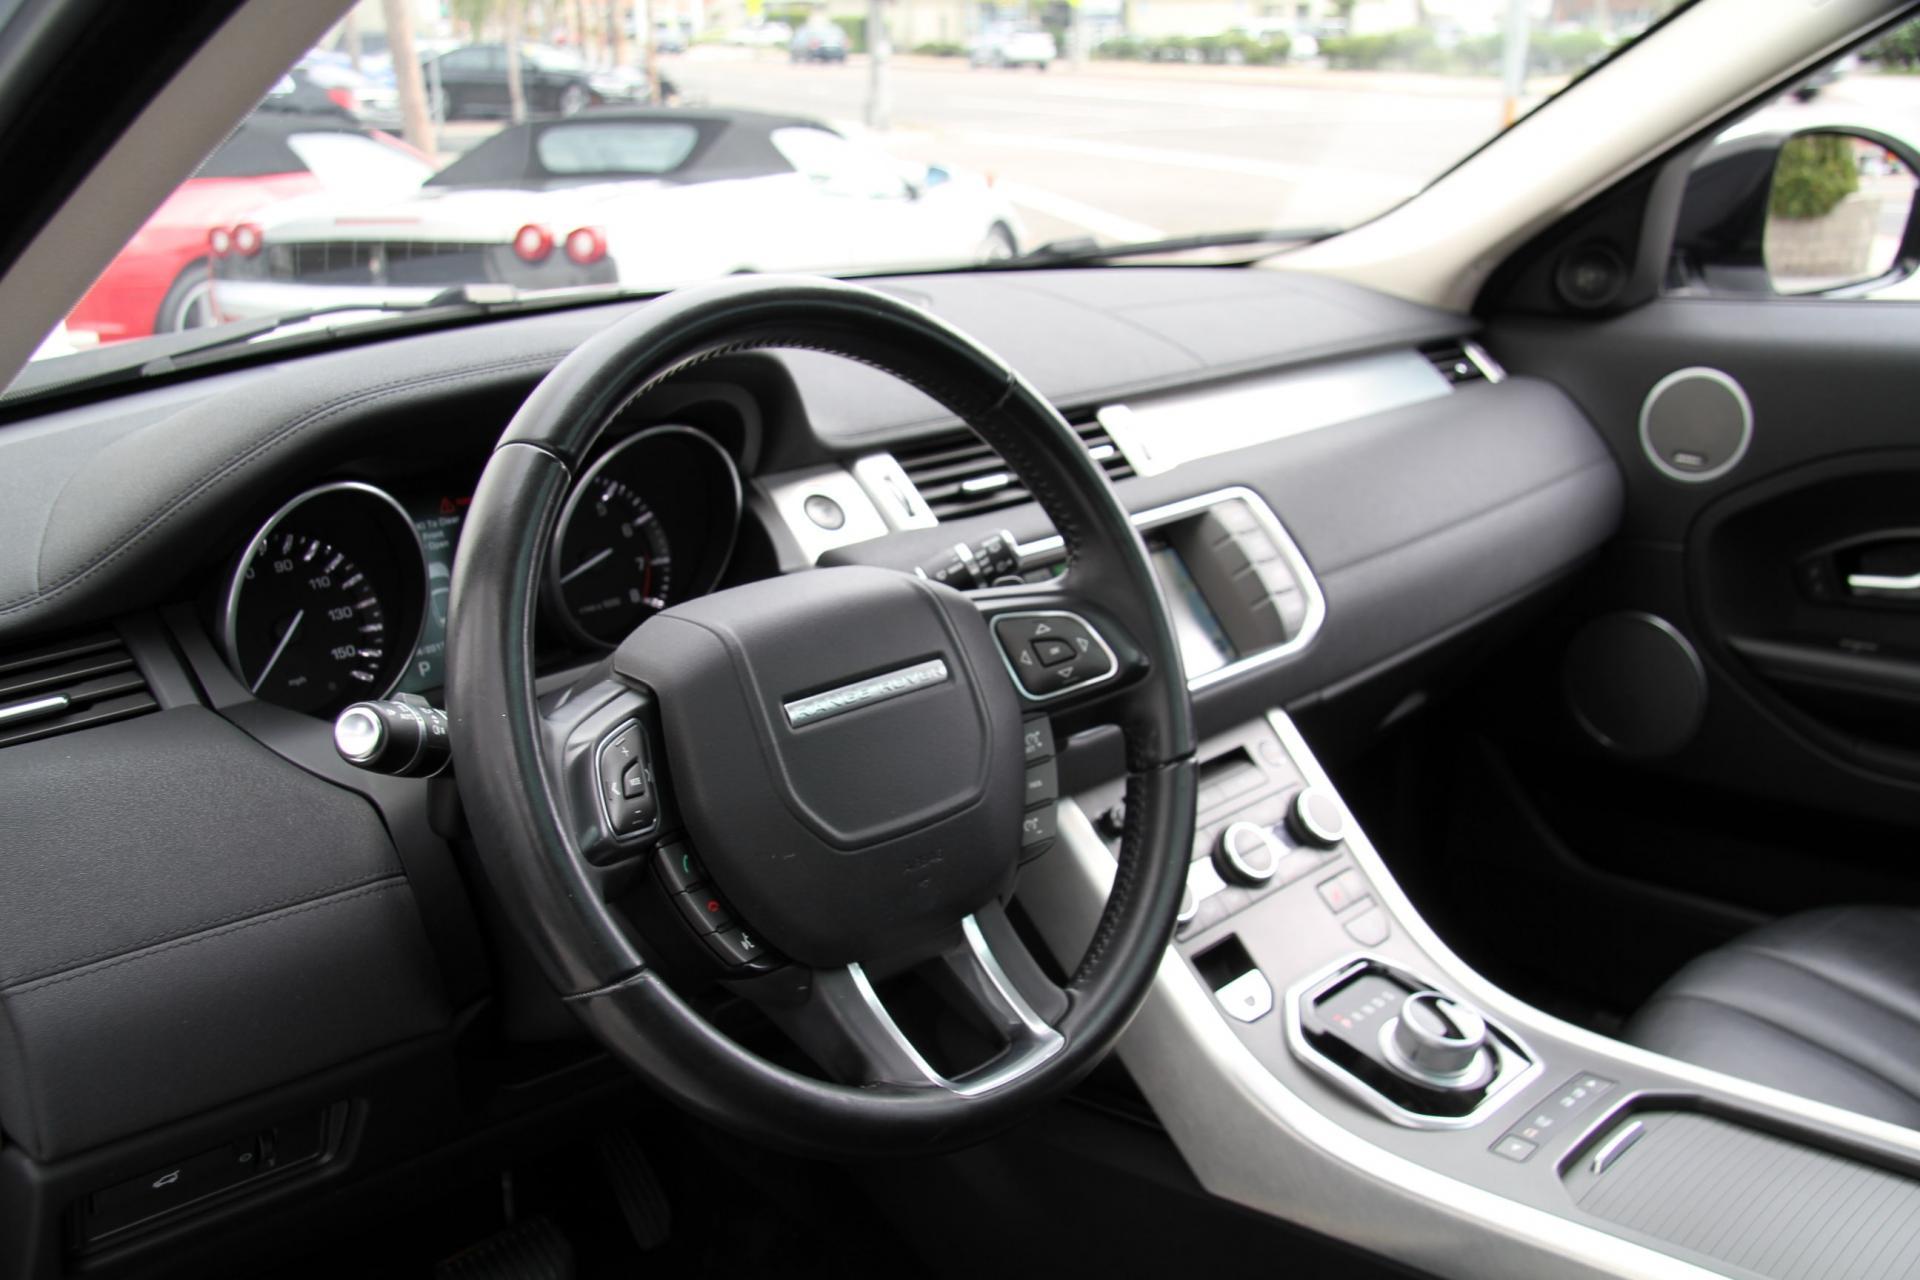 2014 Land Rover Range Rover Evoque Pure Plus Stock 6234